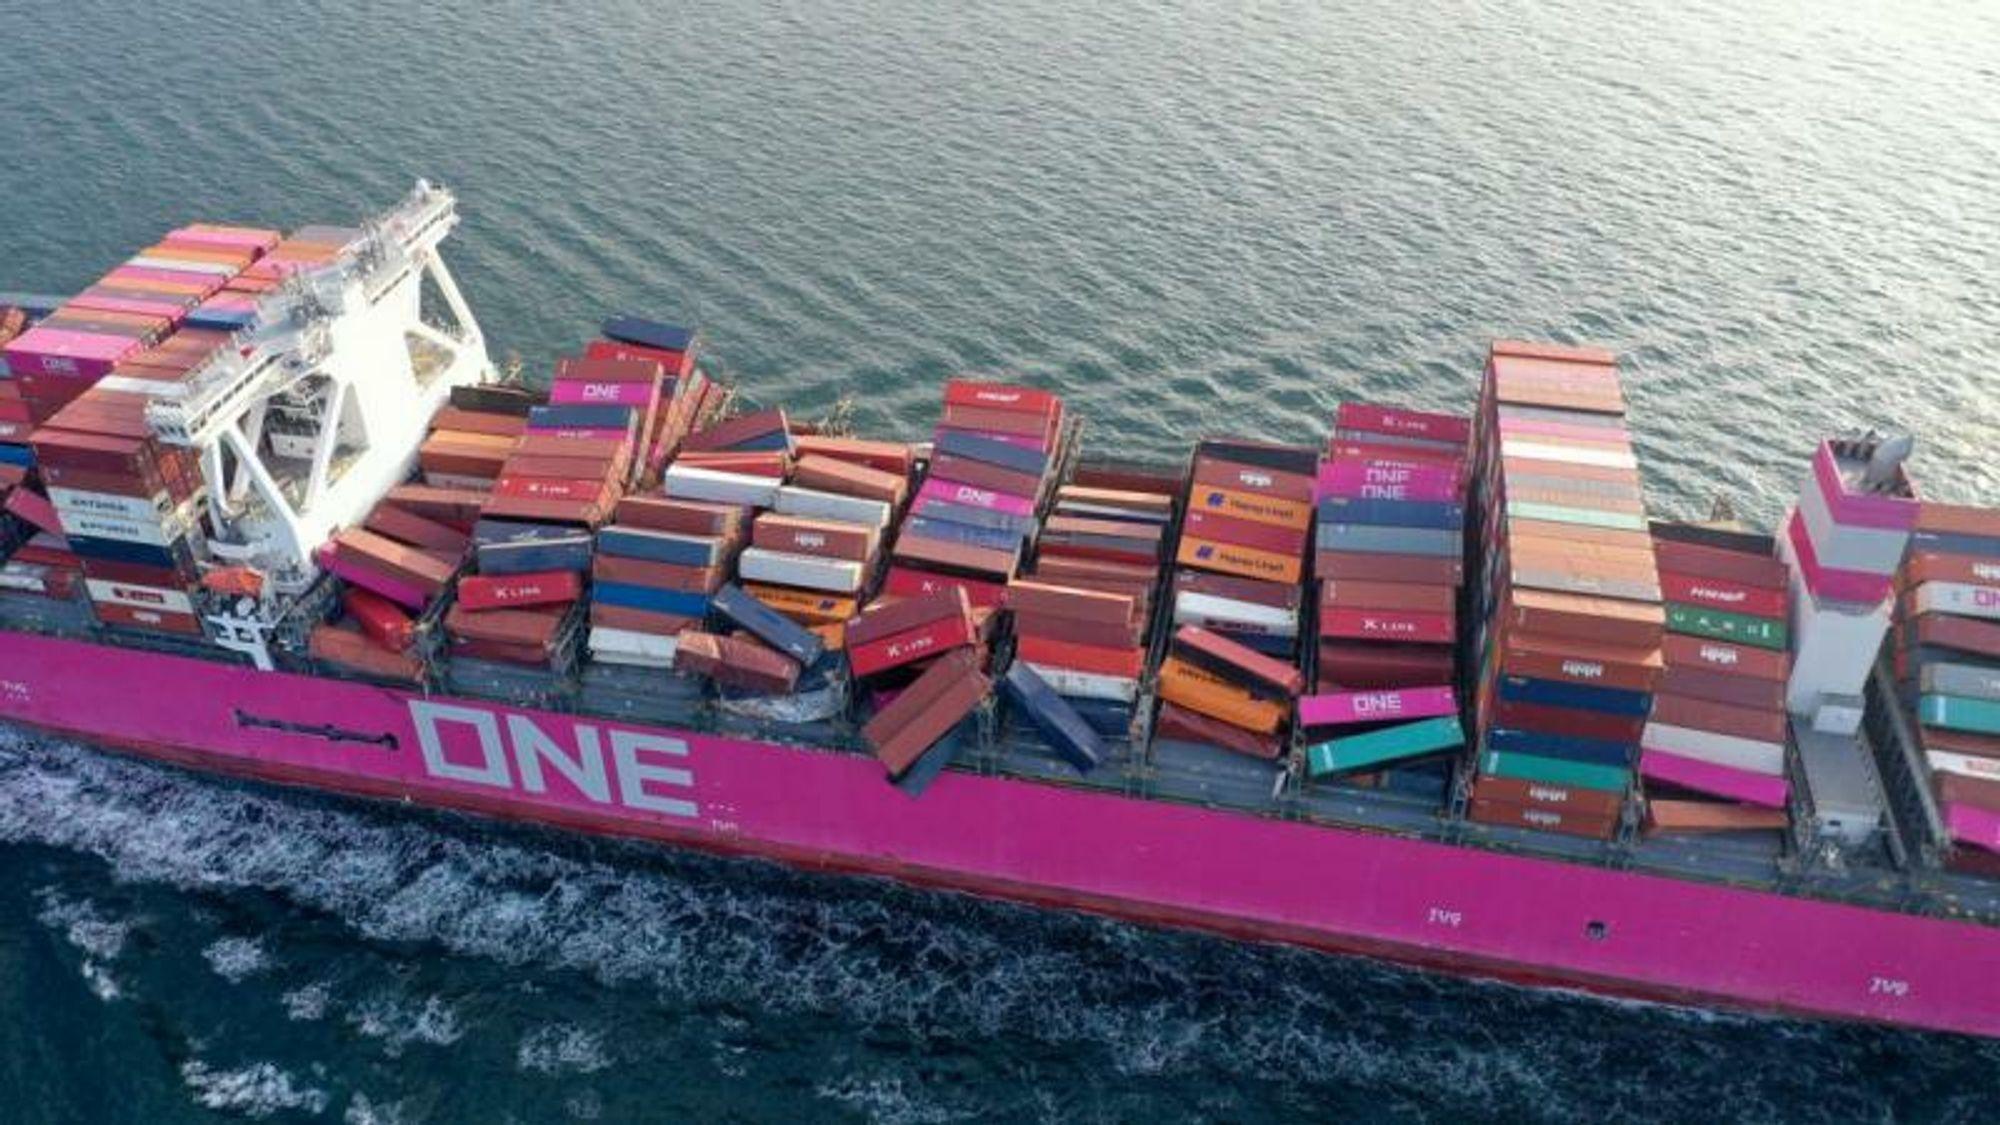 Under en storm i Stillehavet mistet One Apus 2250 containere og måtte søke nødhavn i Kobe, Japan.